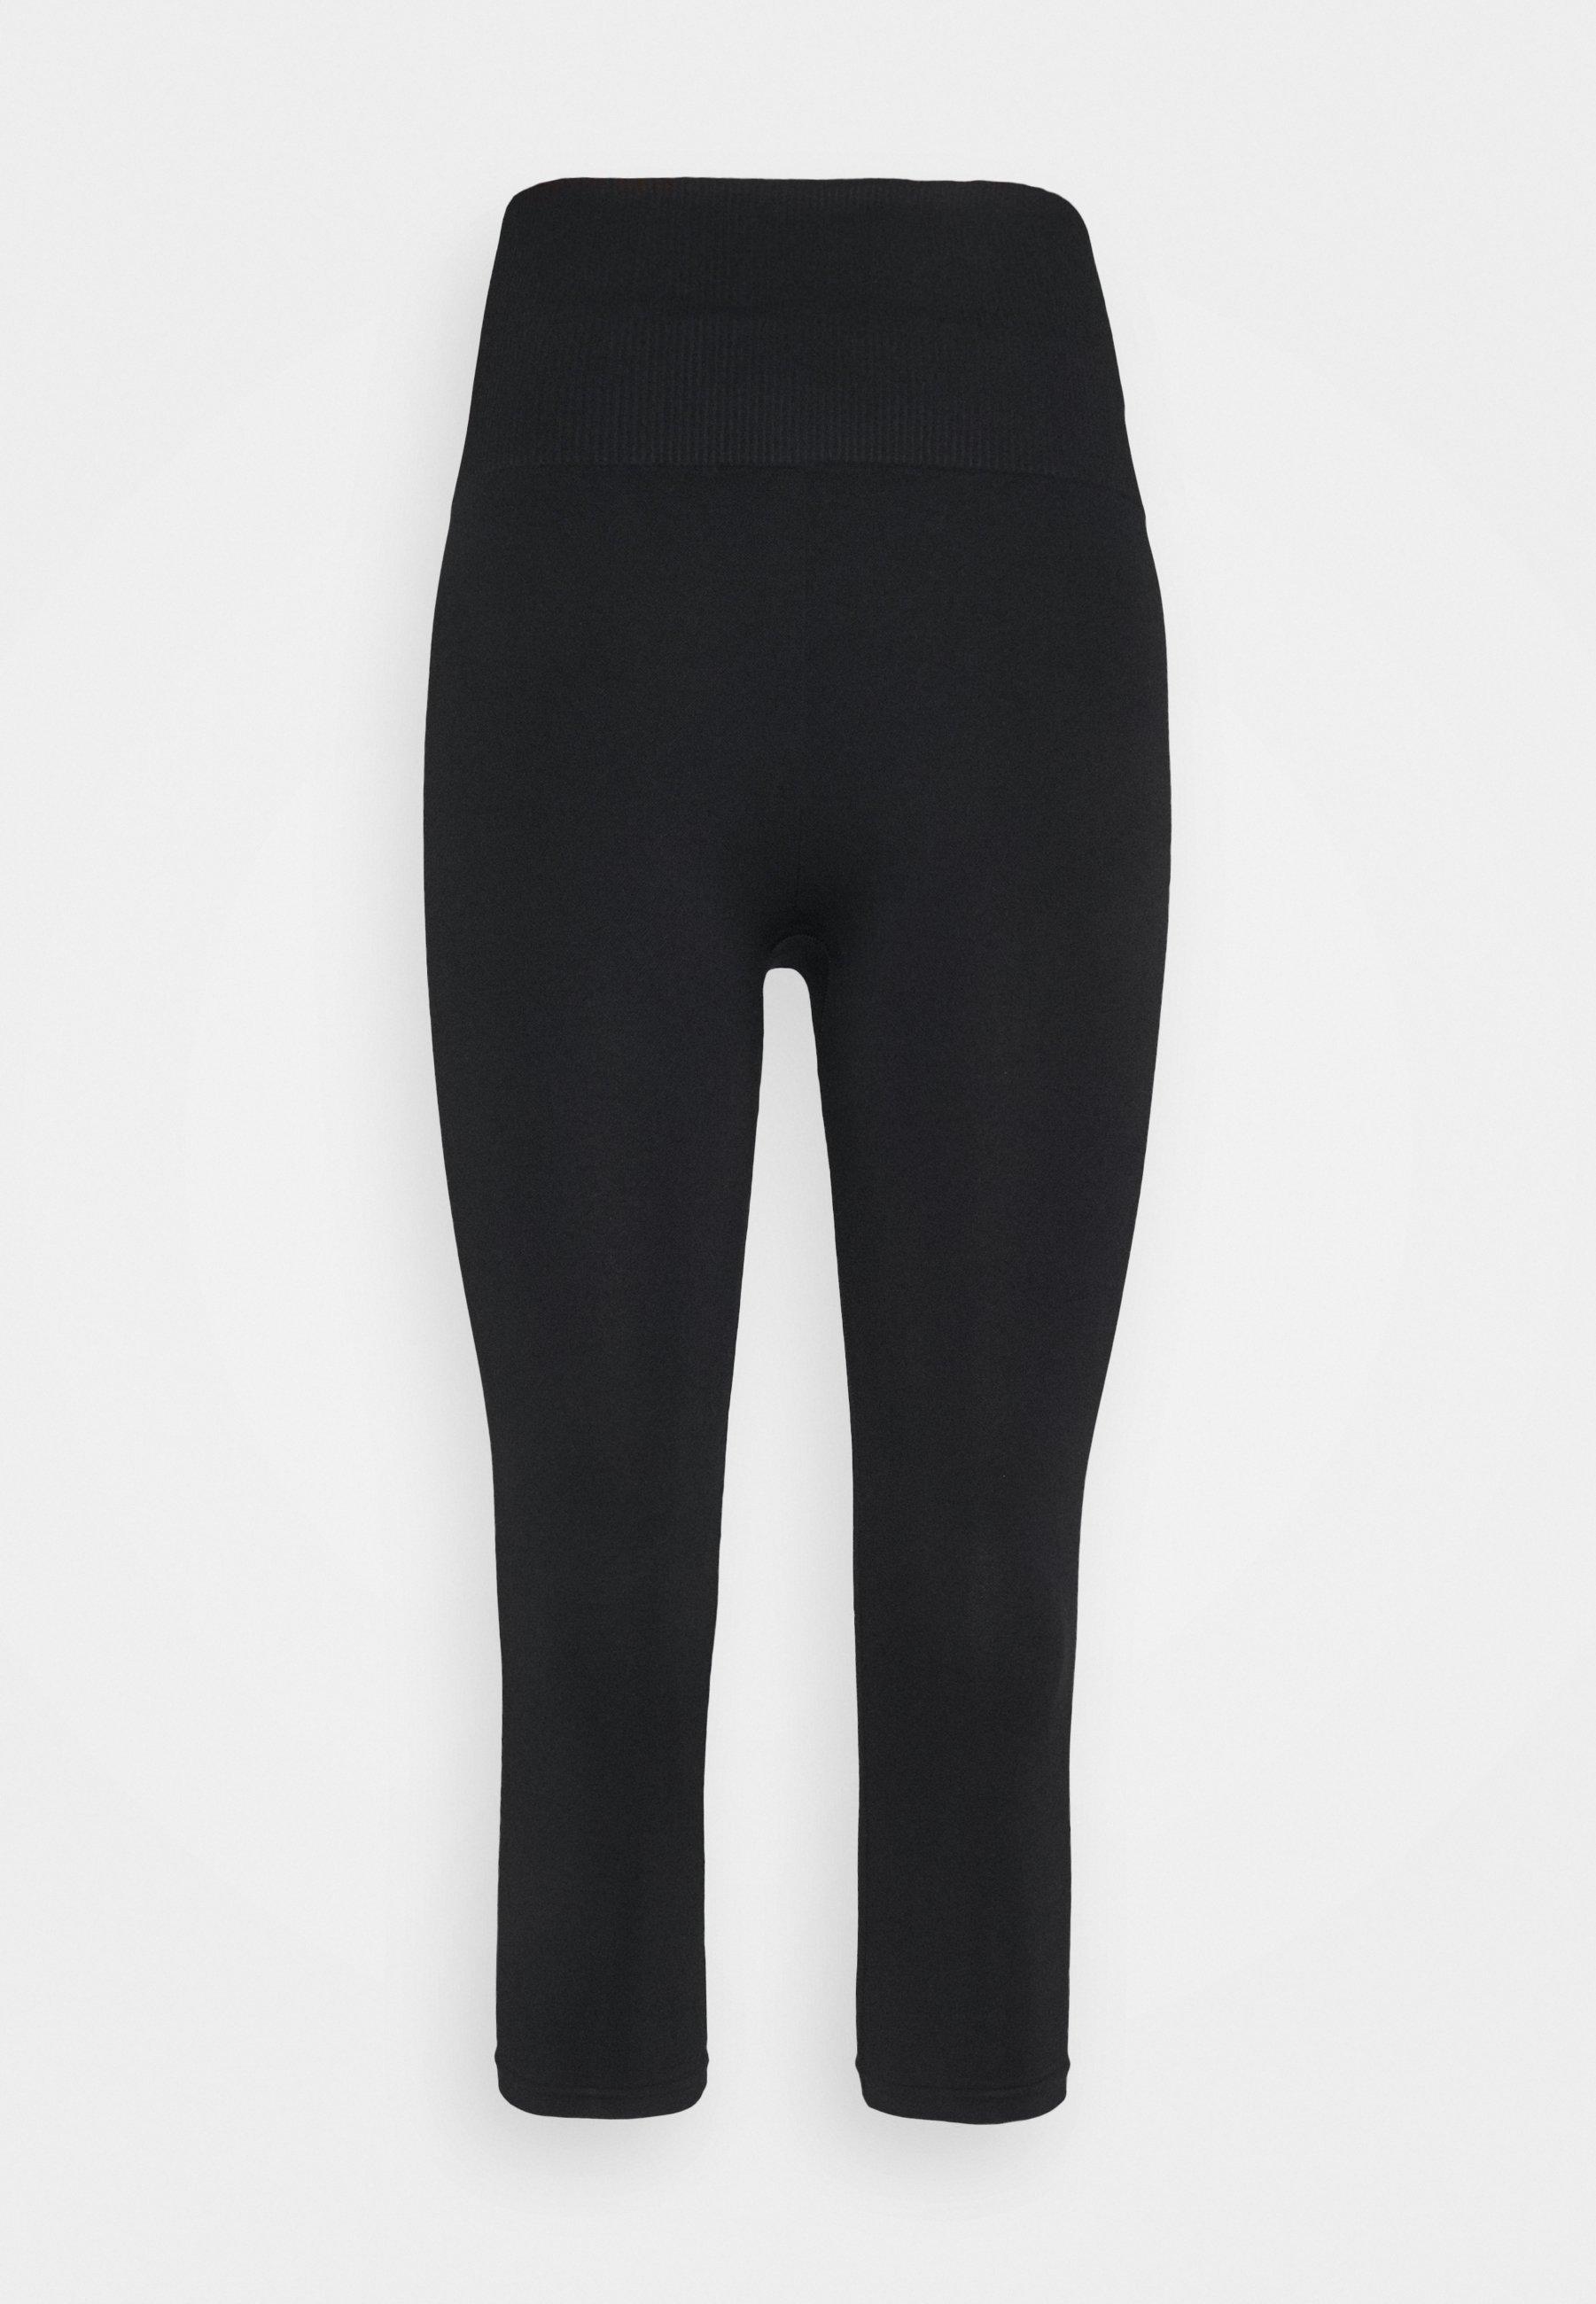 Femme HIGH WAIST 7/8 SEAMLESS LEGGINGS - Collants